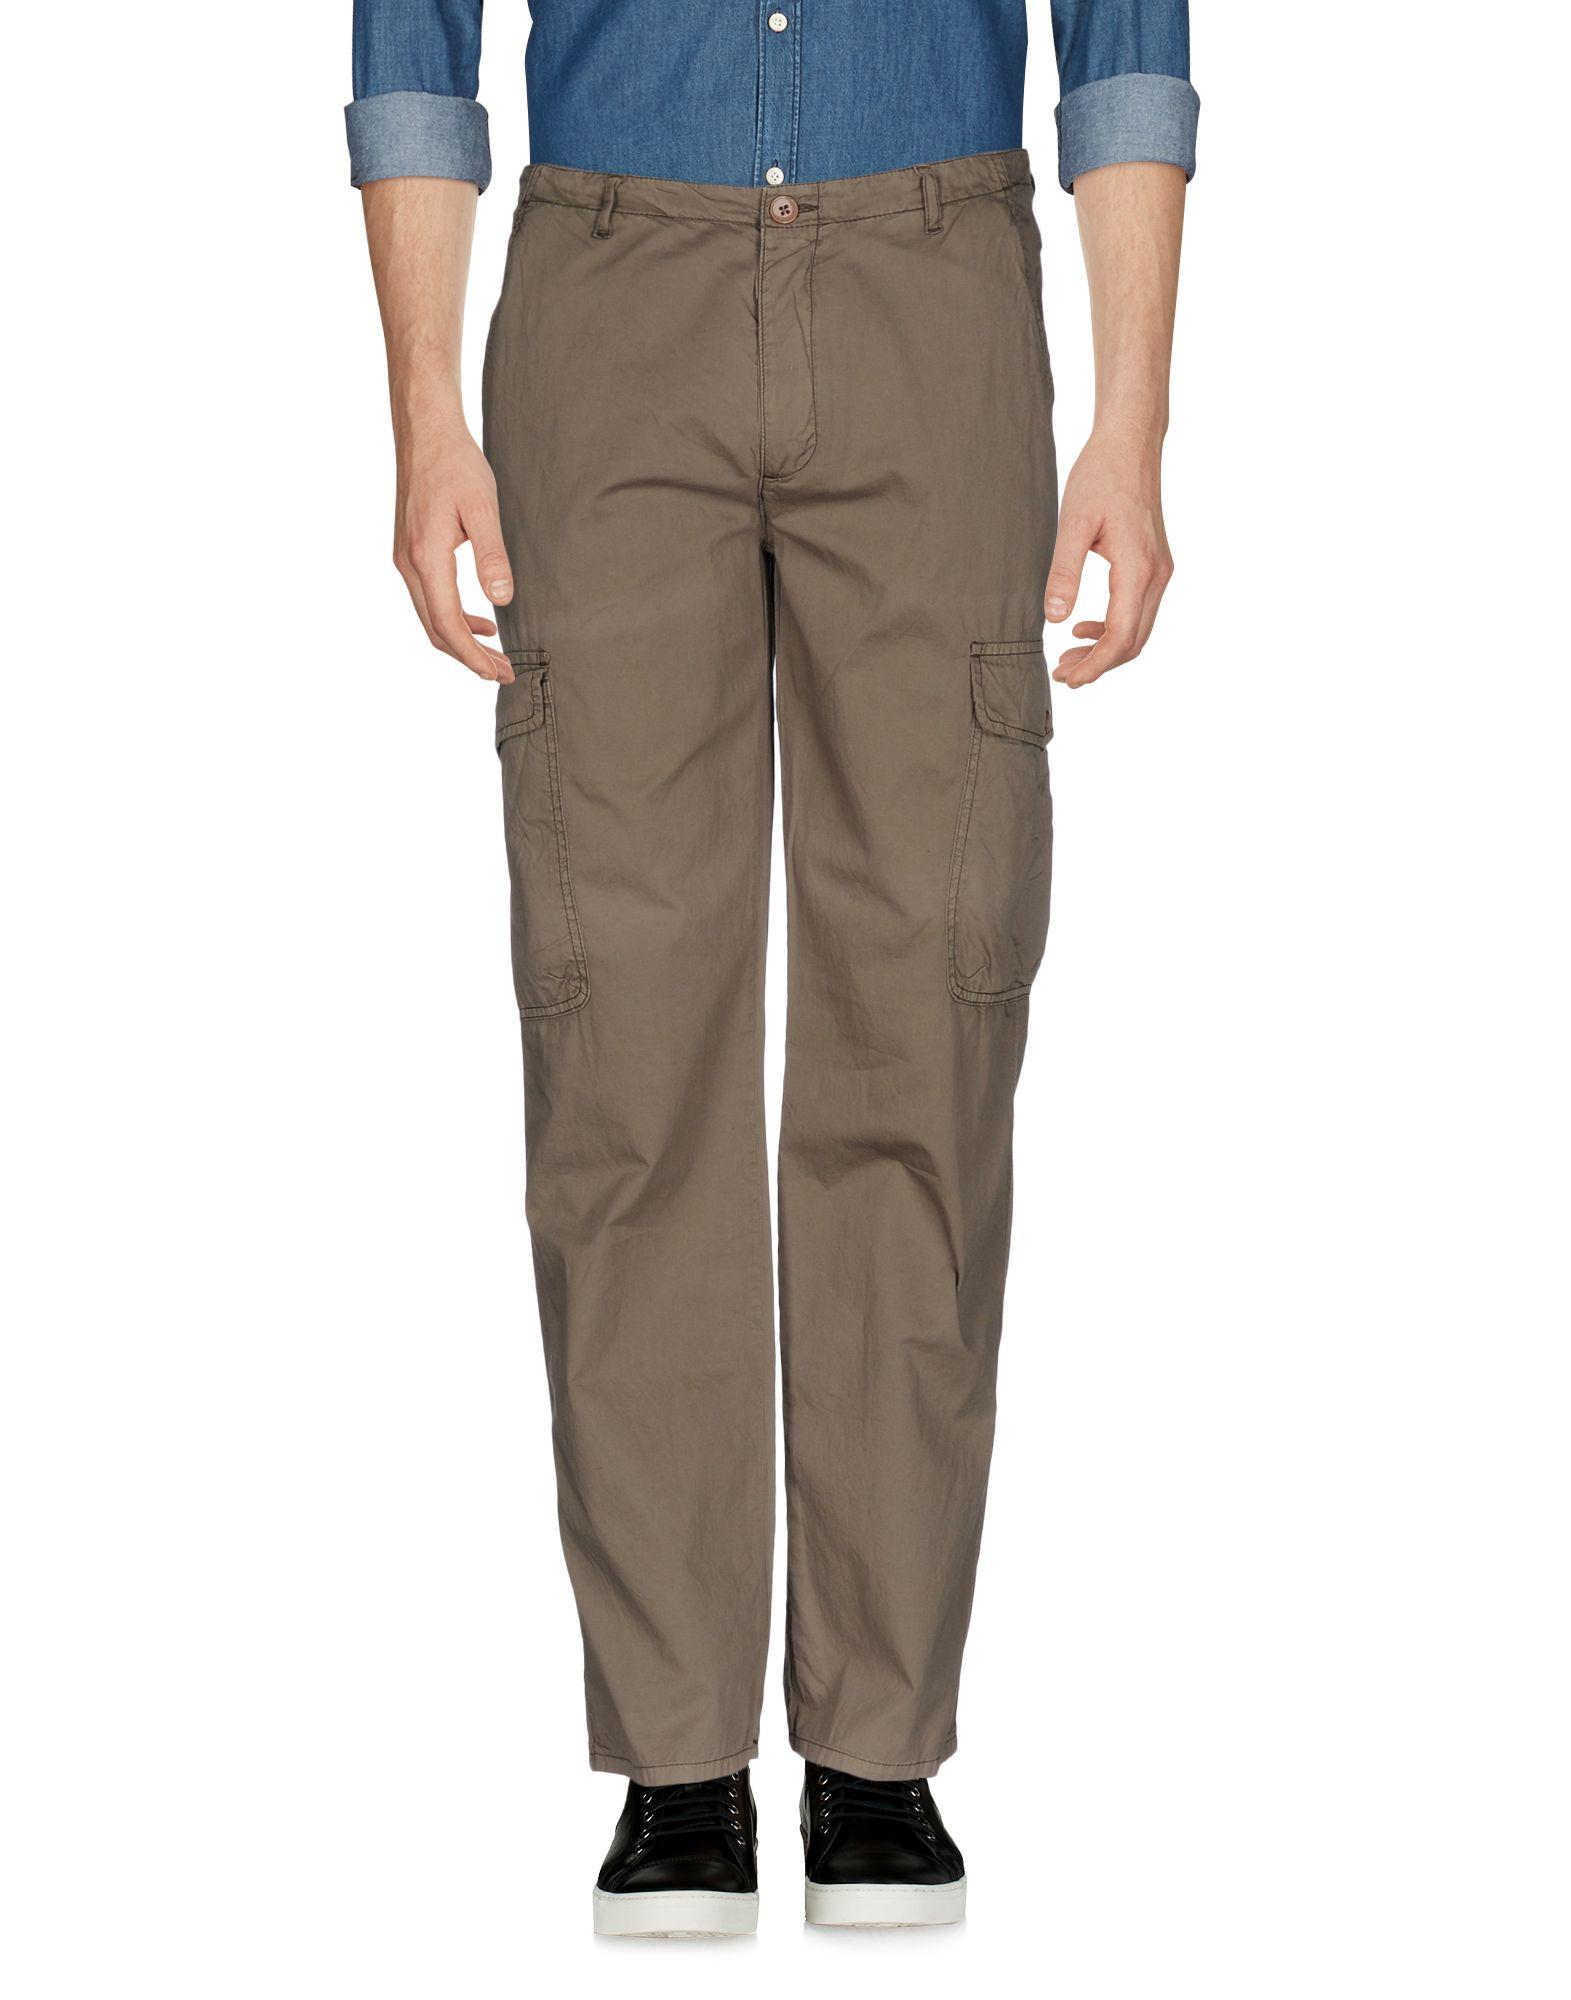 British Khaki Casual Pants